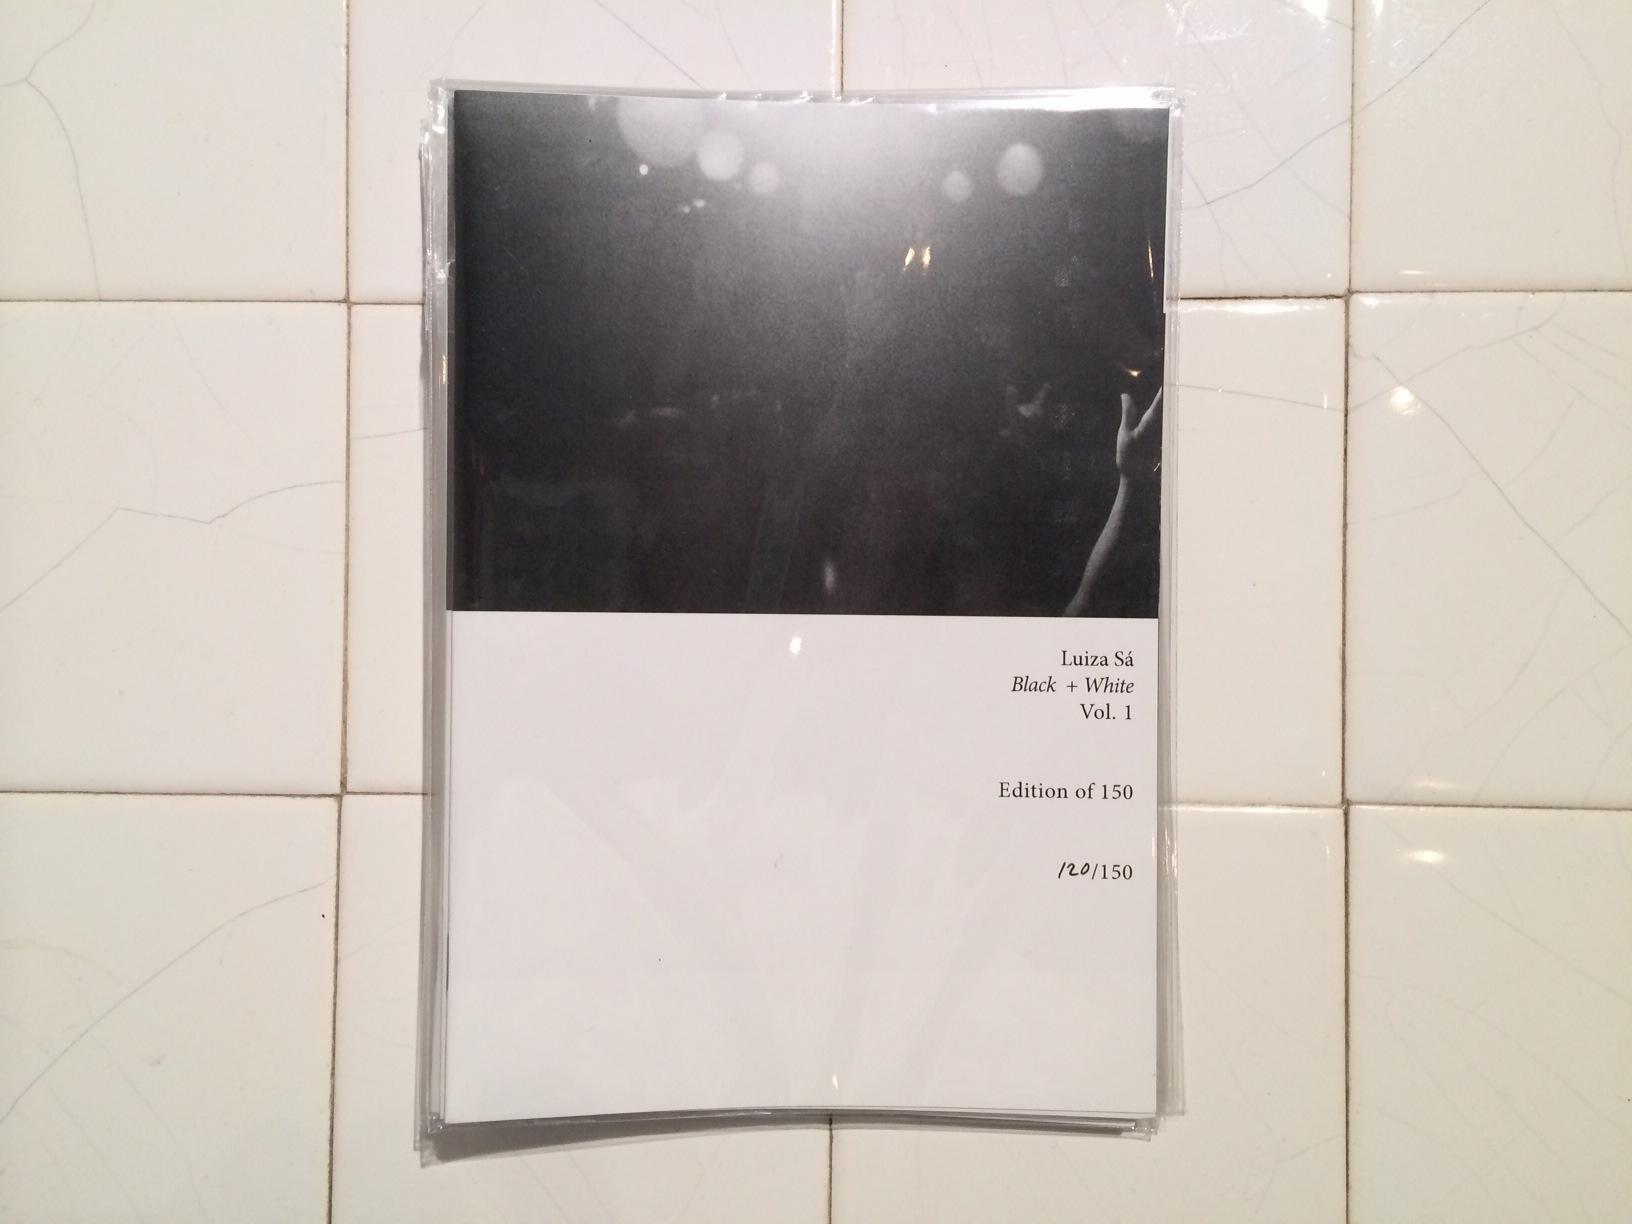 http://kit-gallery.com/schedule/files/luiza01.JPG